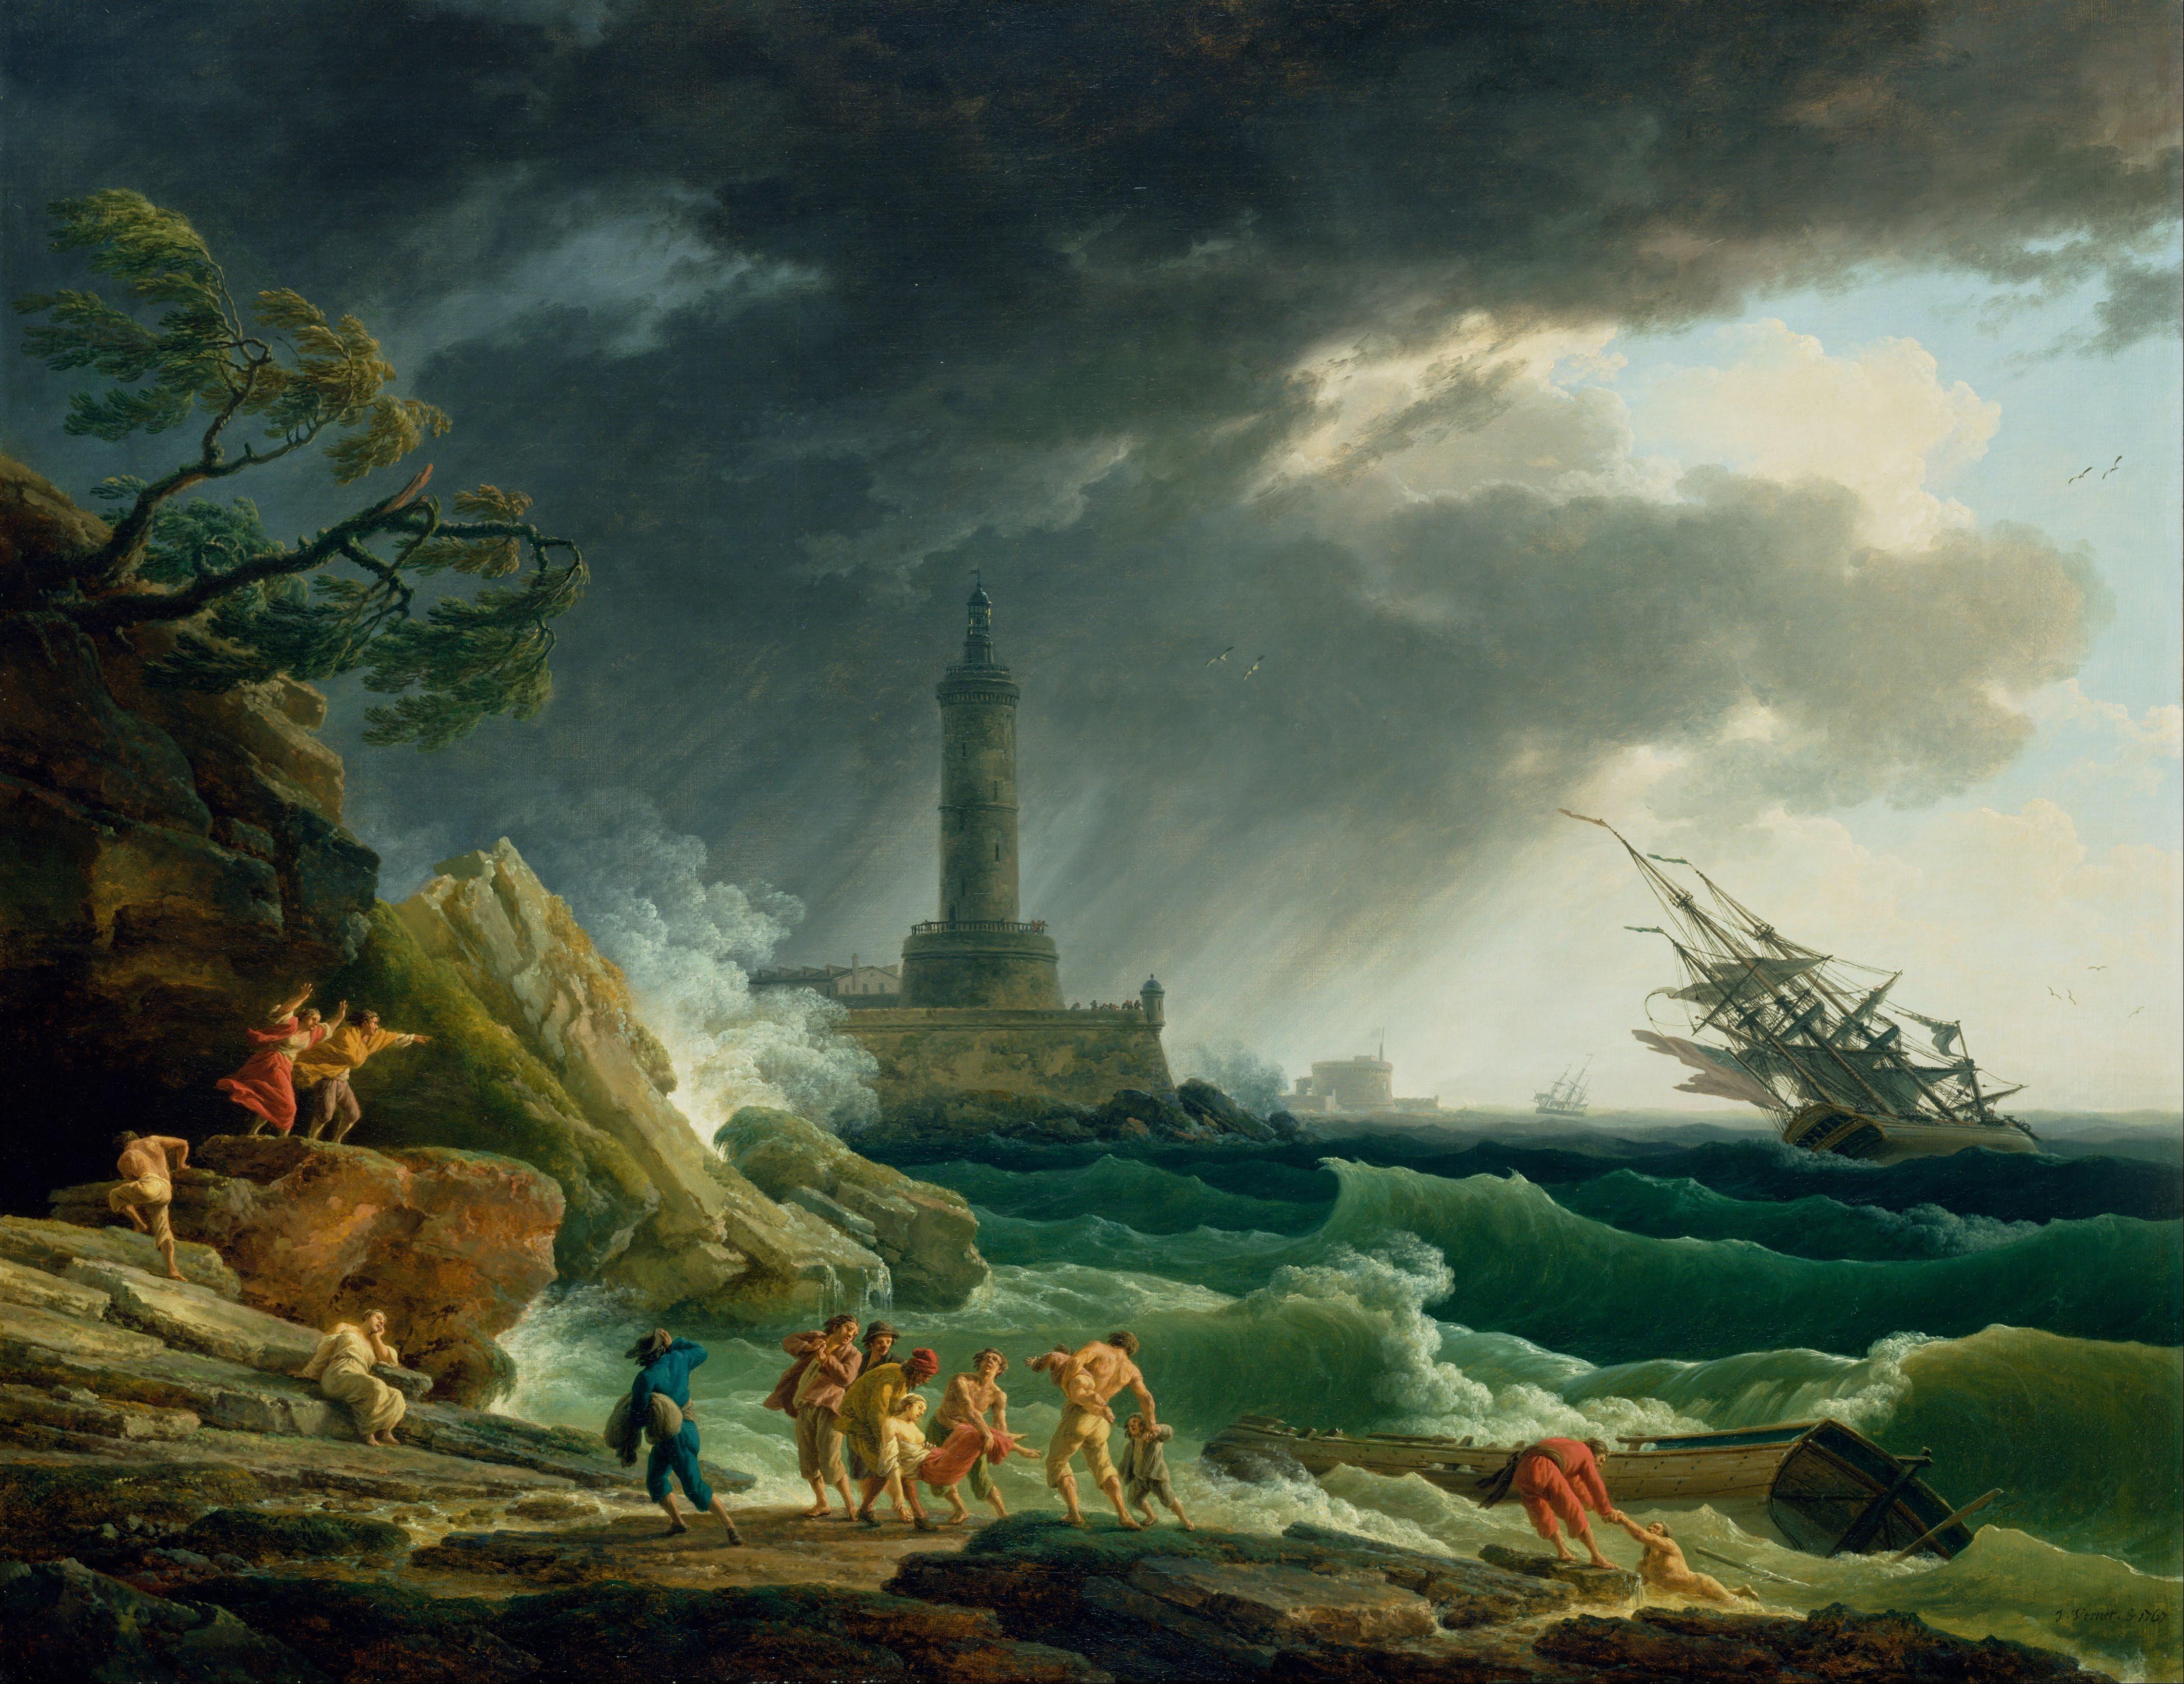 Beach Landscape Sea Water Nature Ocean People Sky Storm Artistic Terrain Painting Rocks Outside Clouds Screenshot